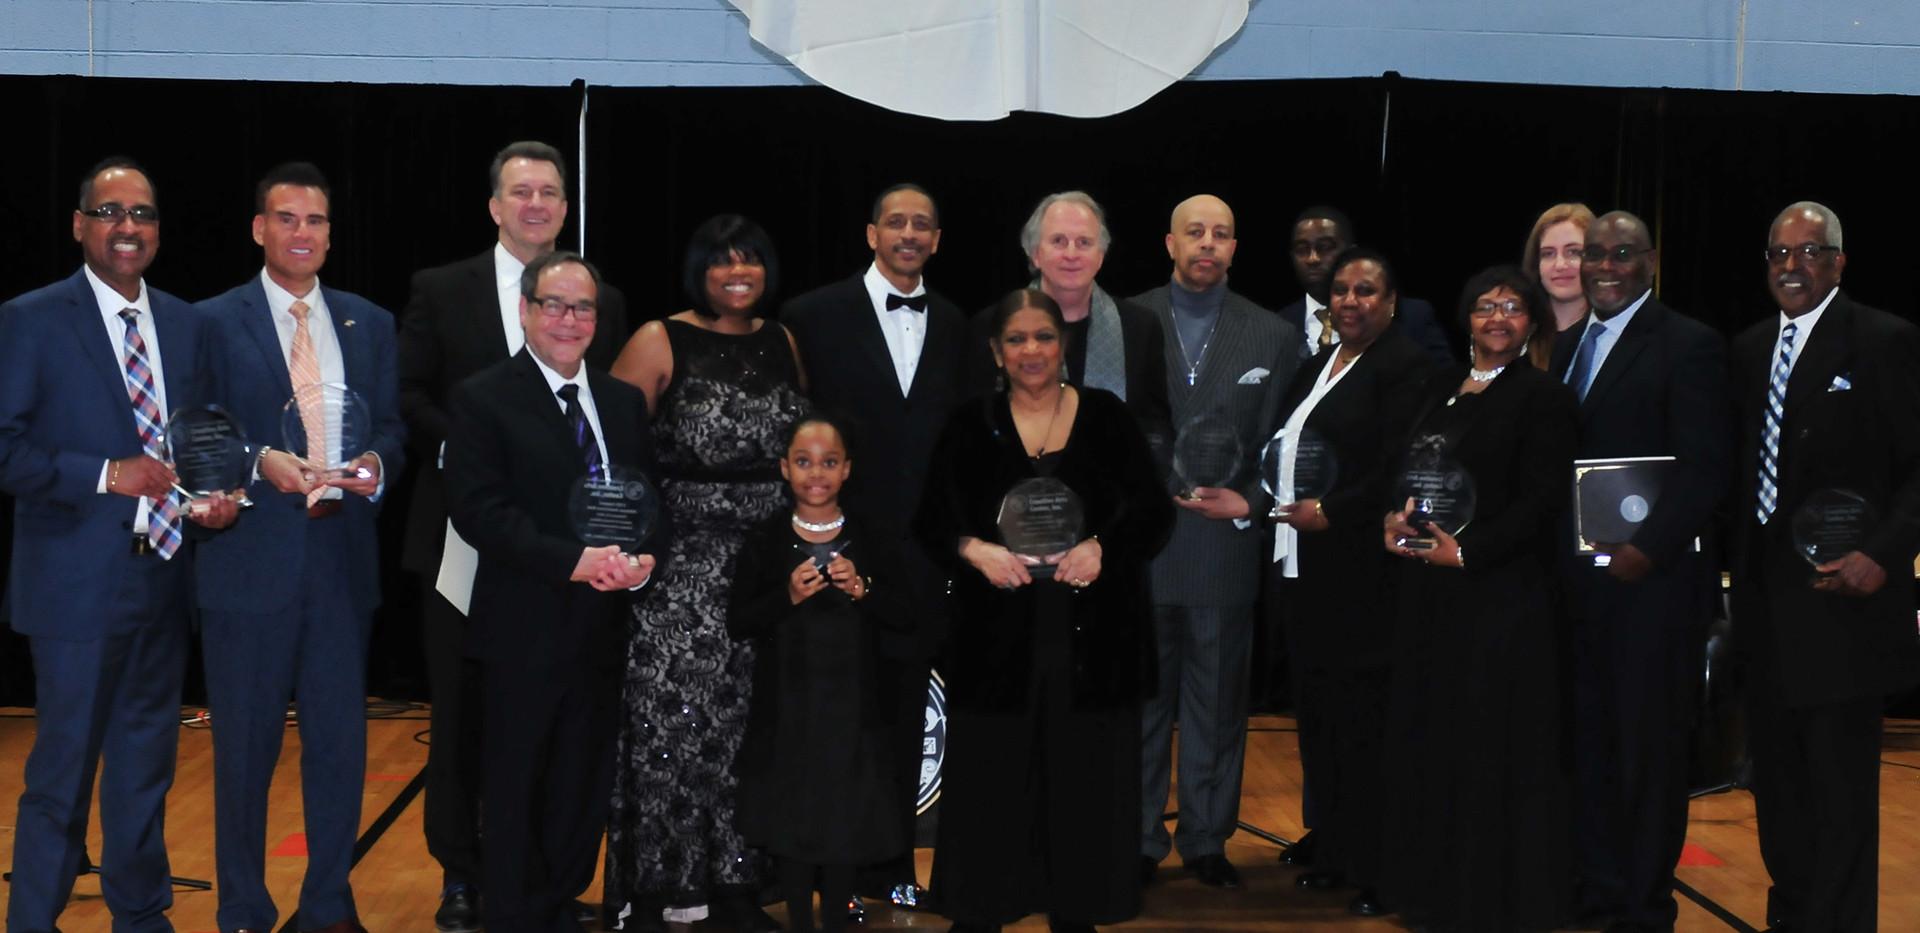 2019 Honorees